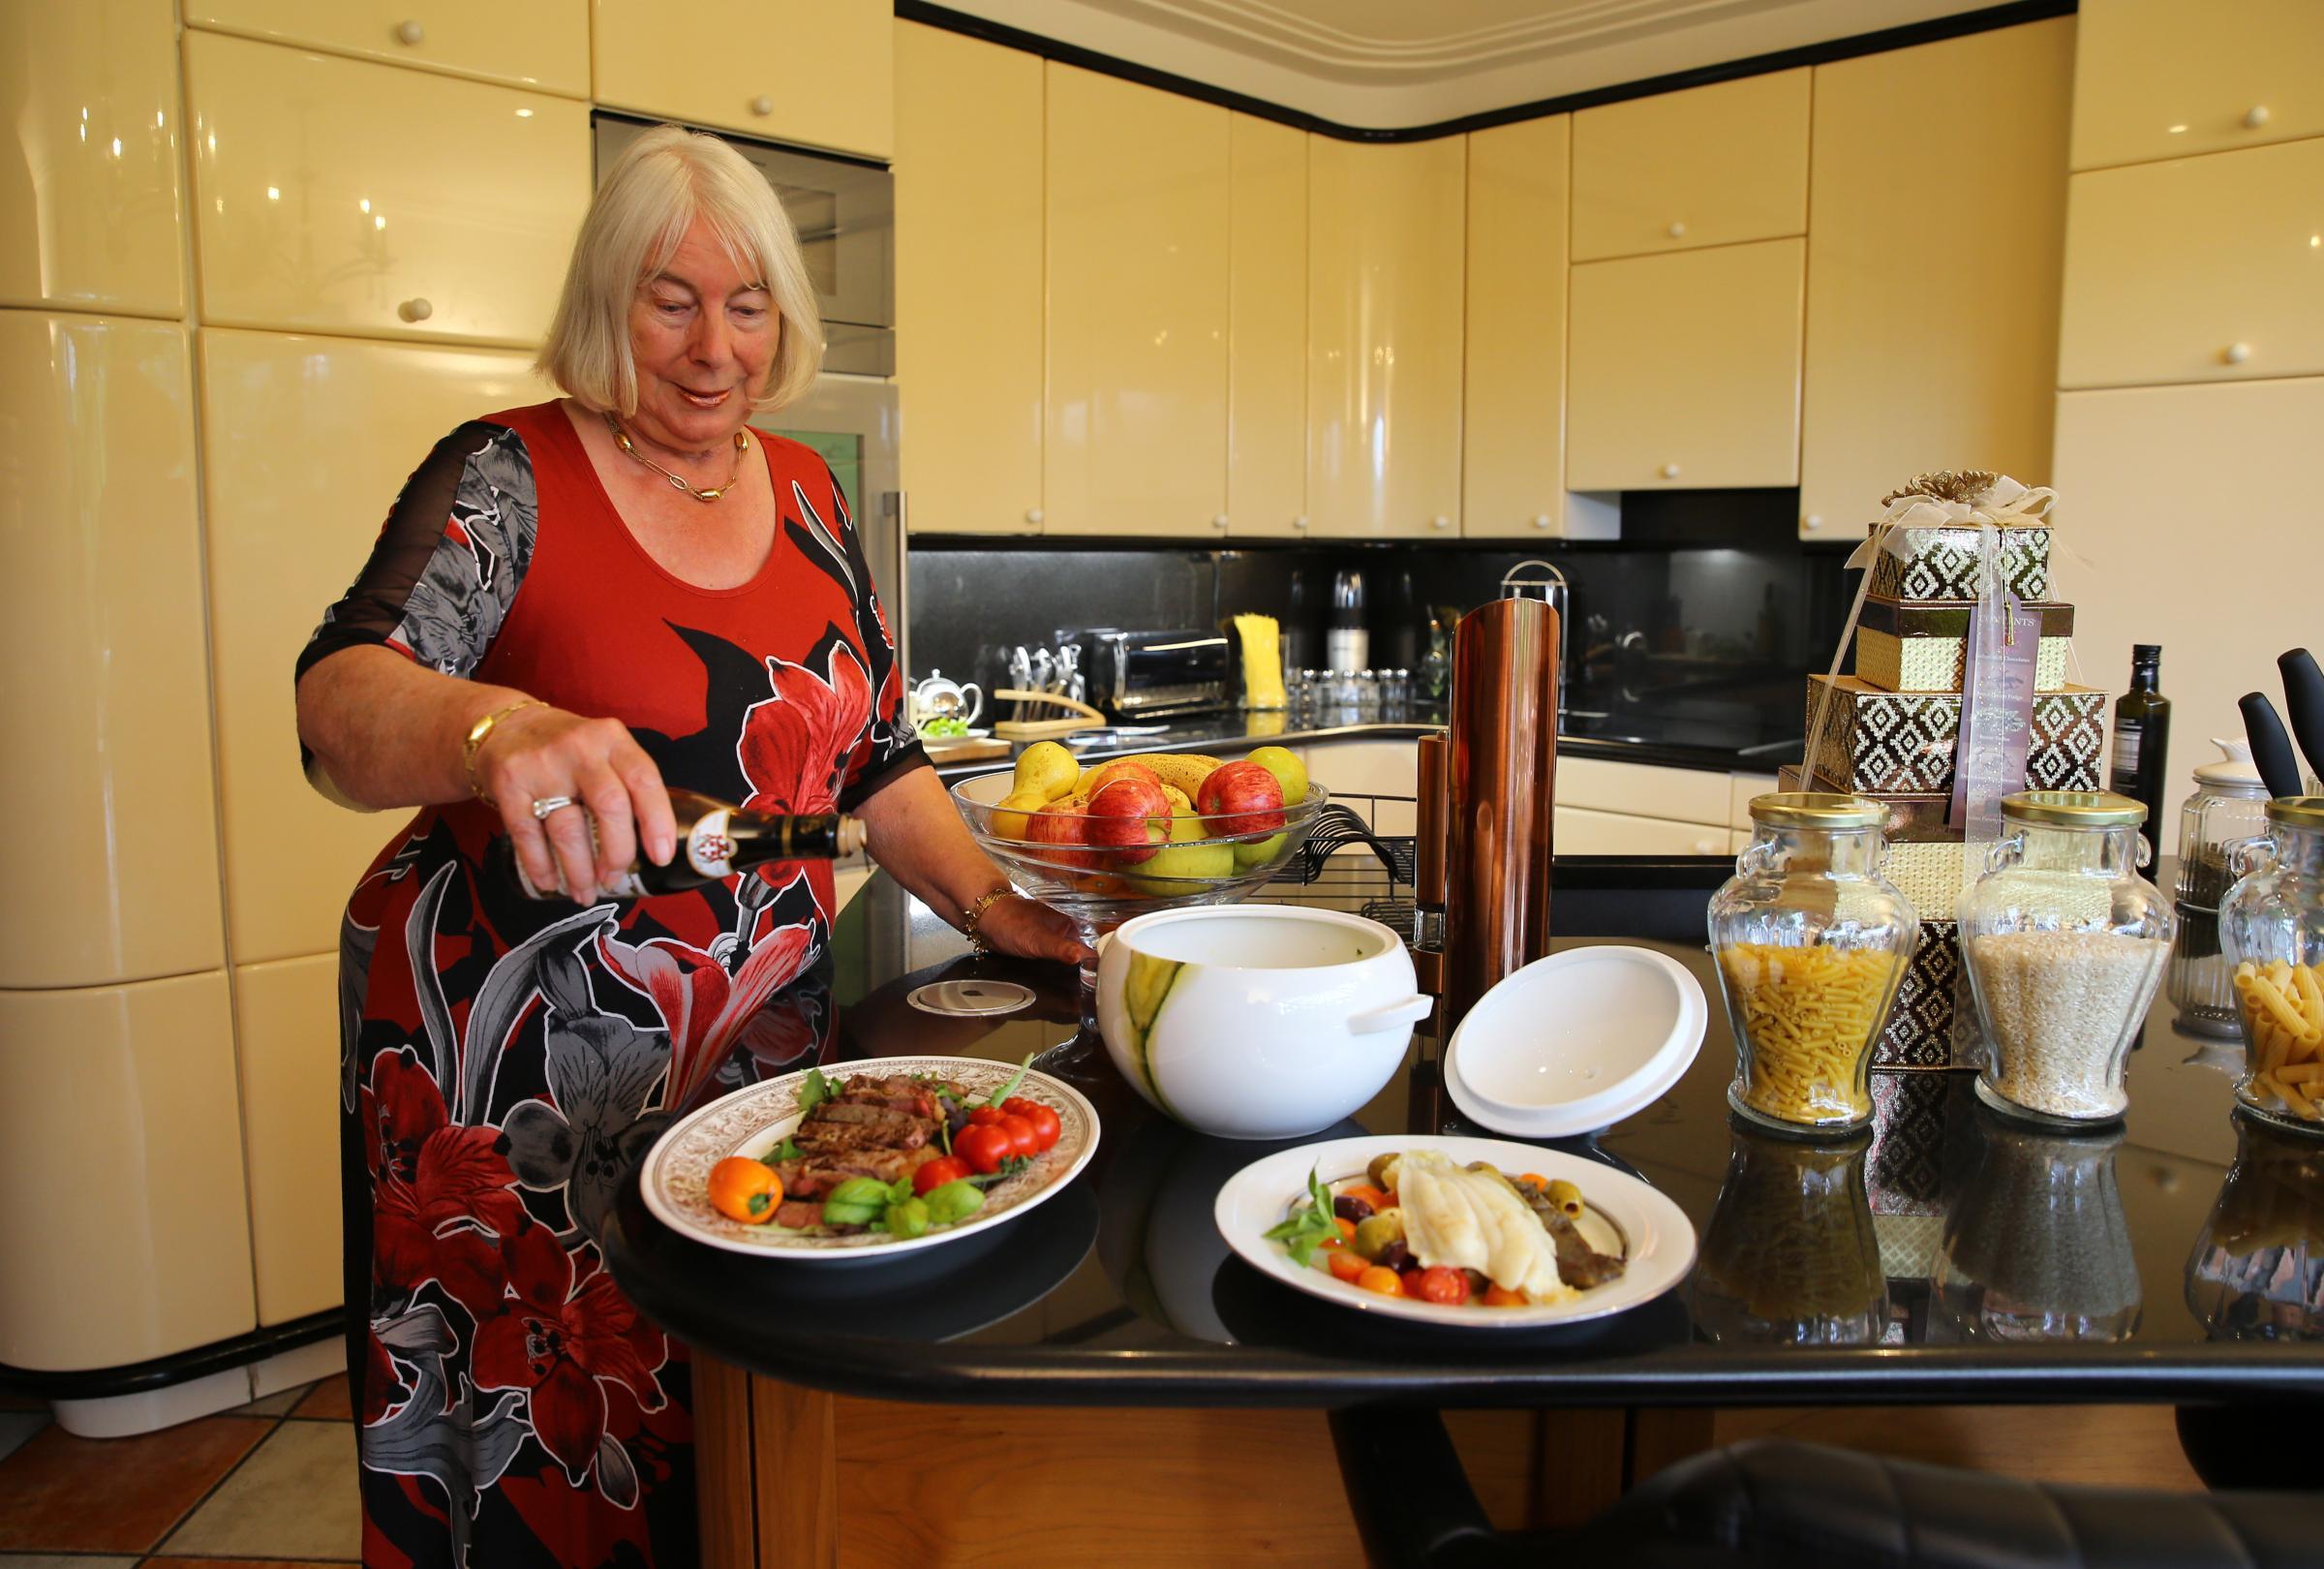 Glasgow food and drink:  Italian boat trip inspires tasty fish dish